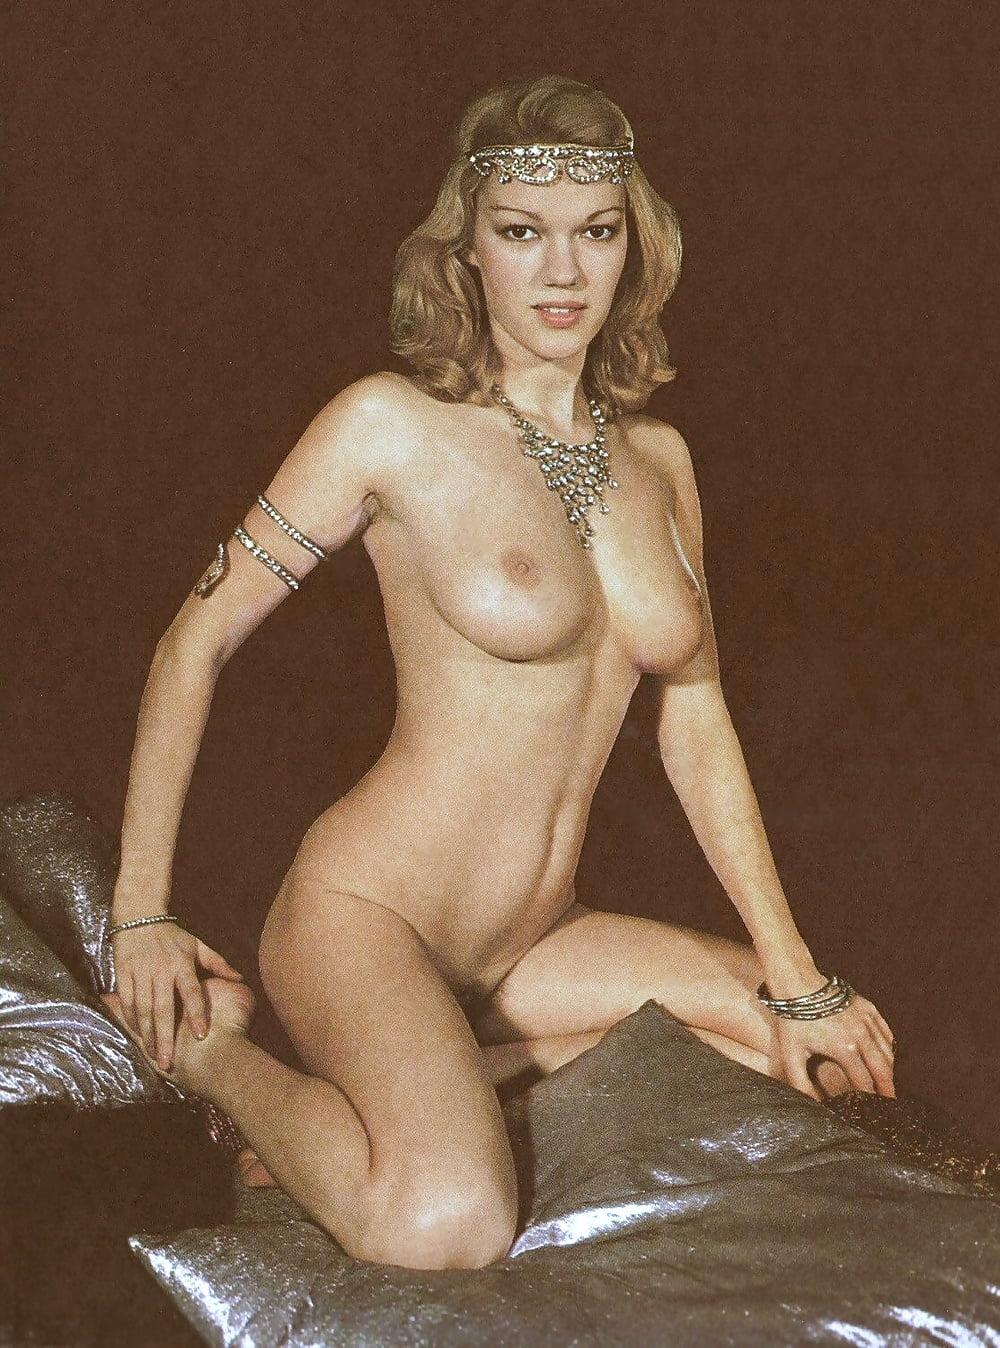 Nude brigitte lahaie — photo 4